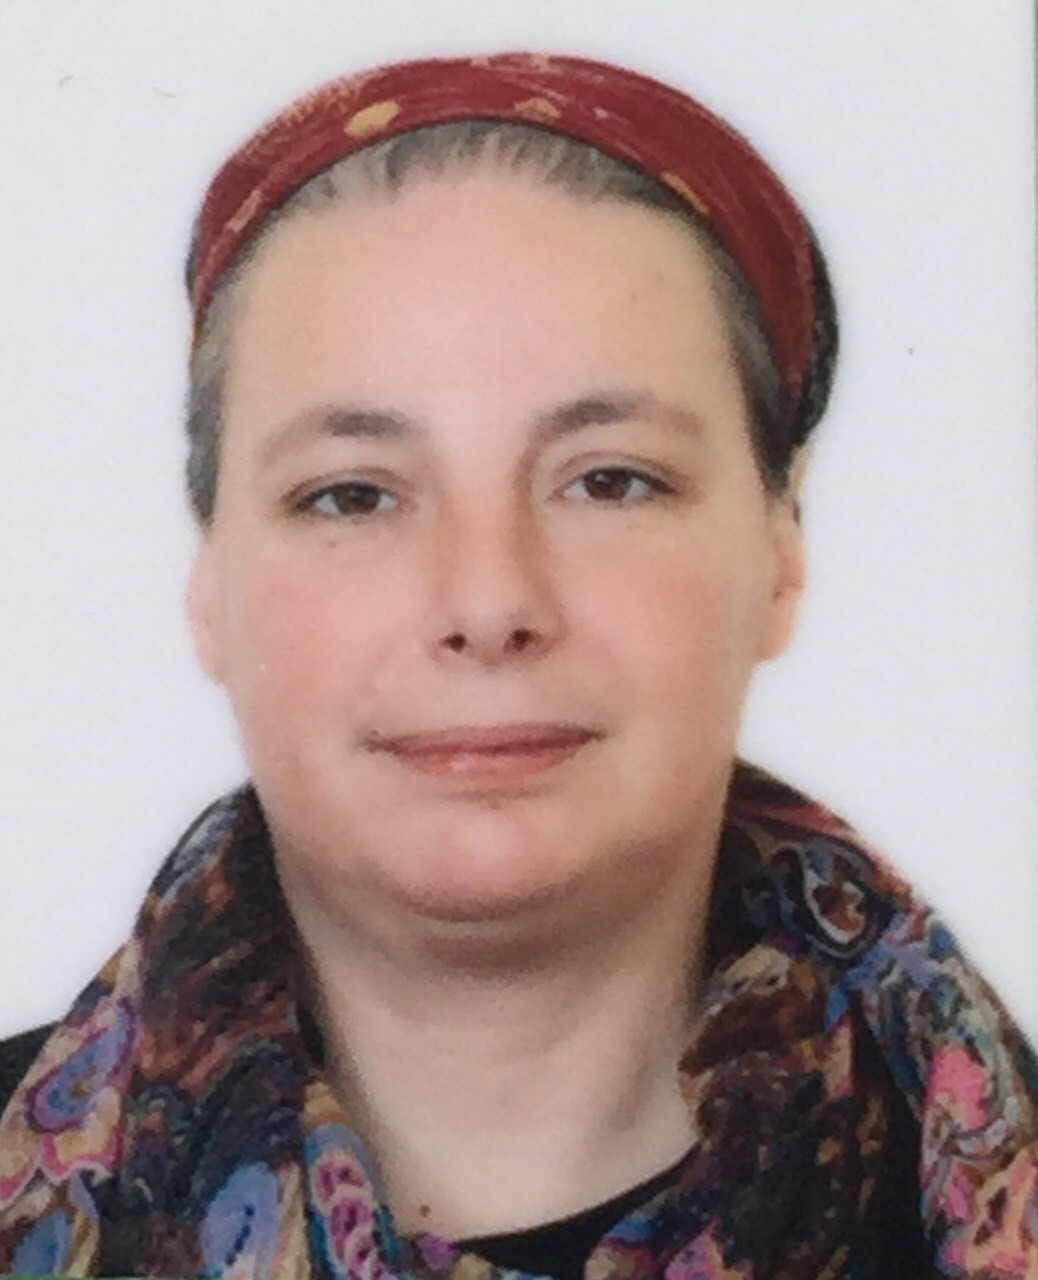 Muratova, Nurie.